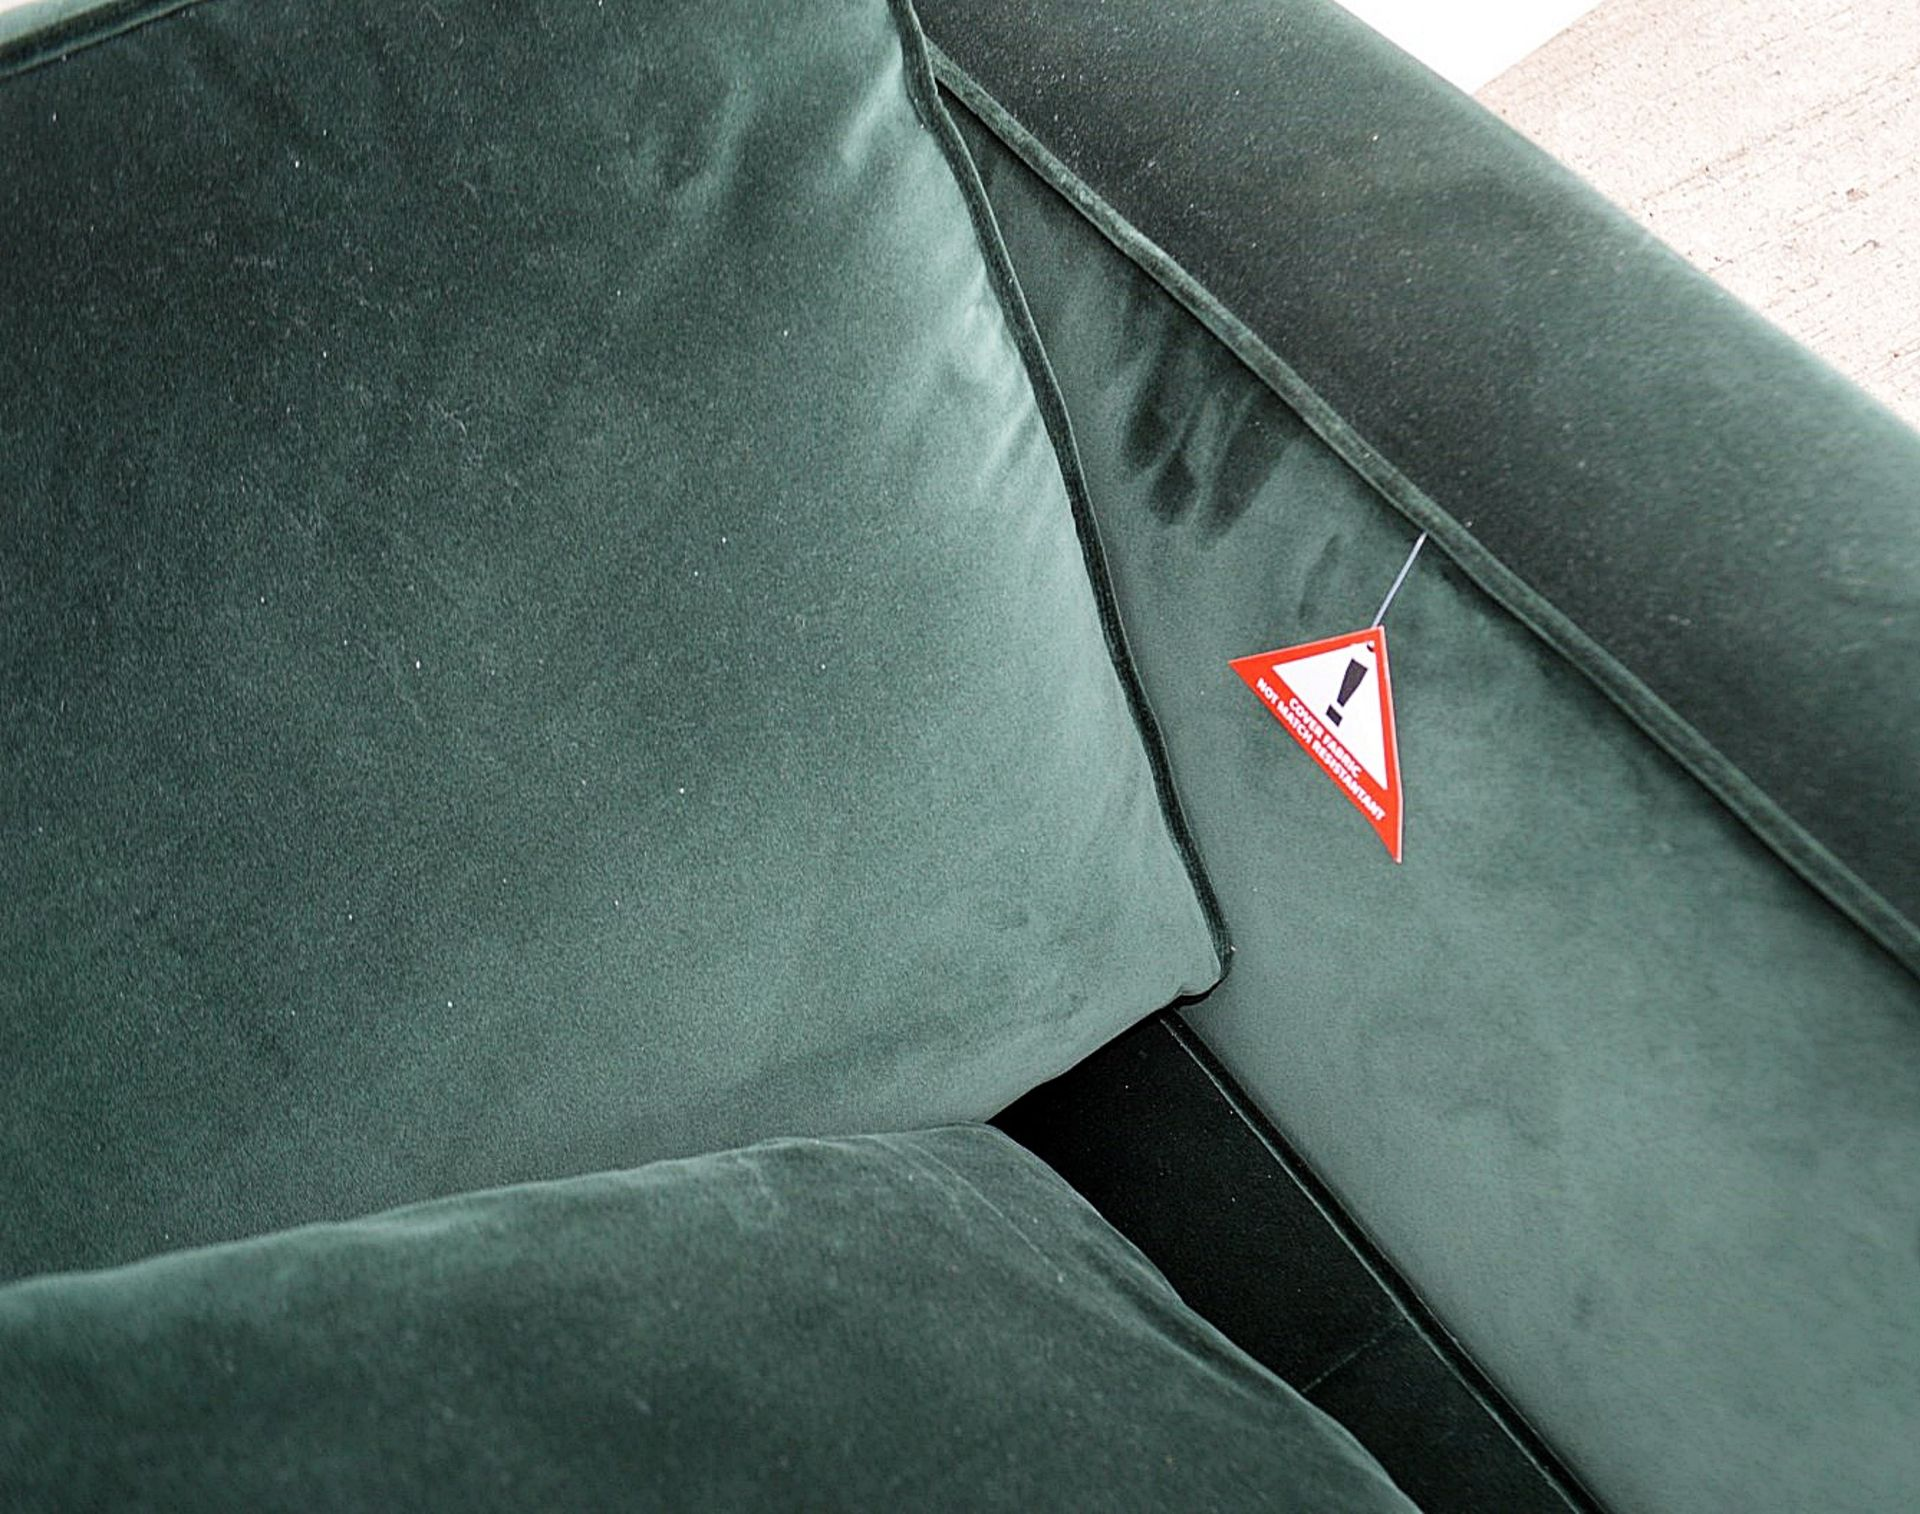 2 x B&B Italia MAXALTO Luxury Sofa Sections Both Upholstered In Rich Dark Green Velvet - RRP £7,248 - Image 11 of 13